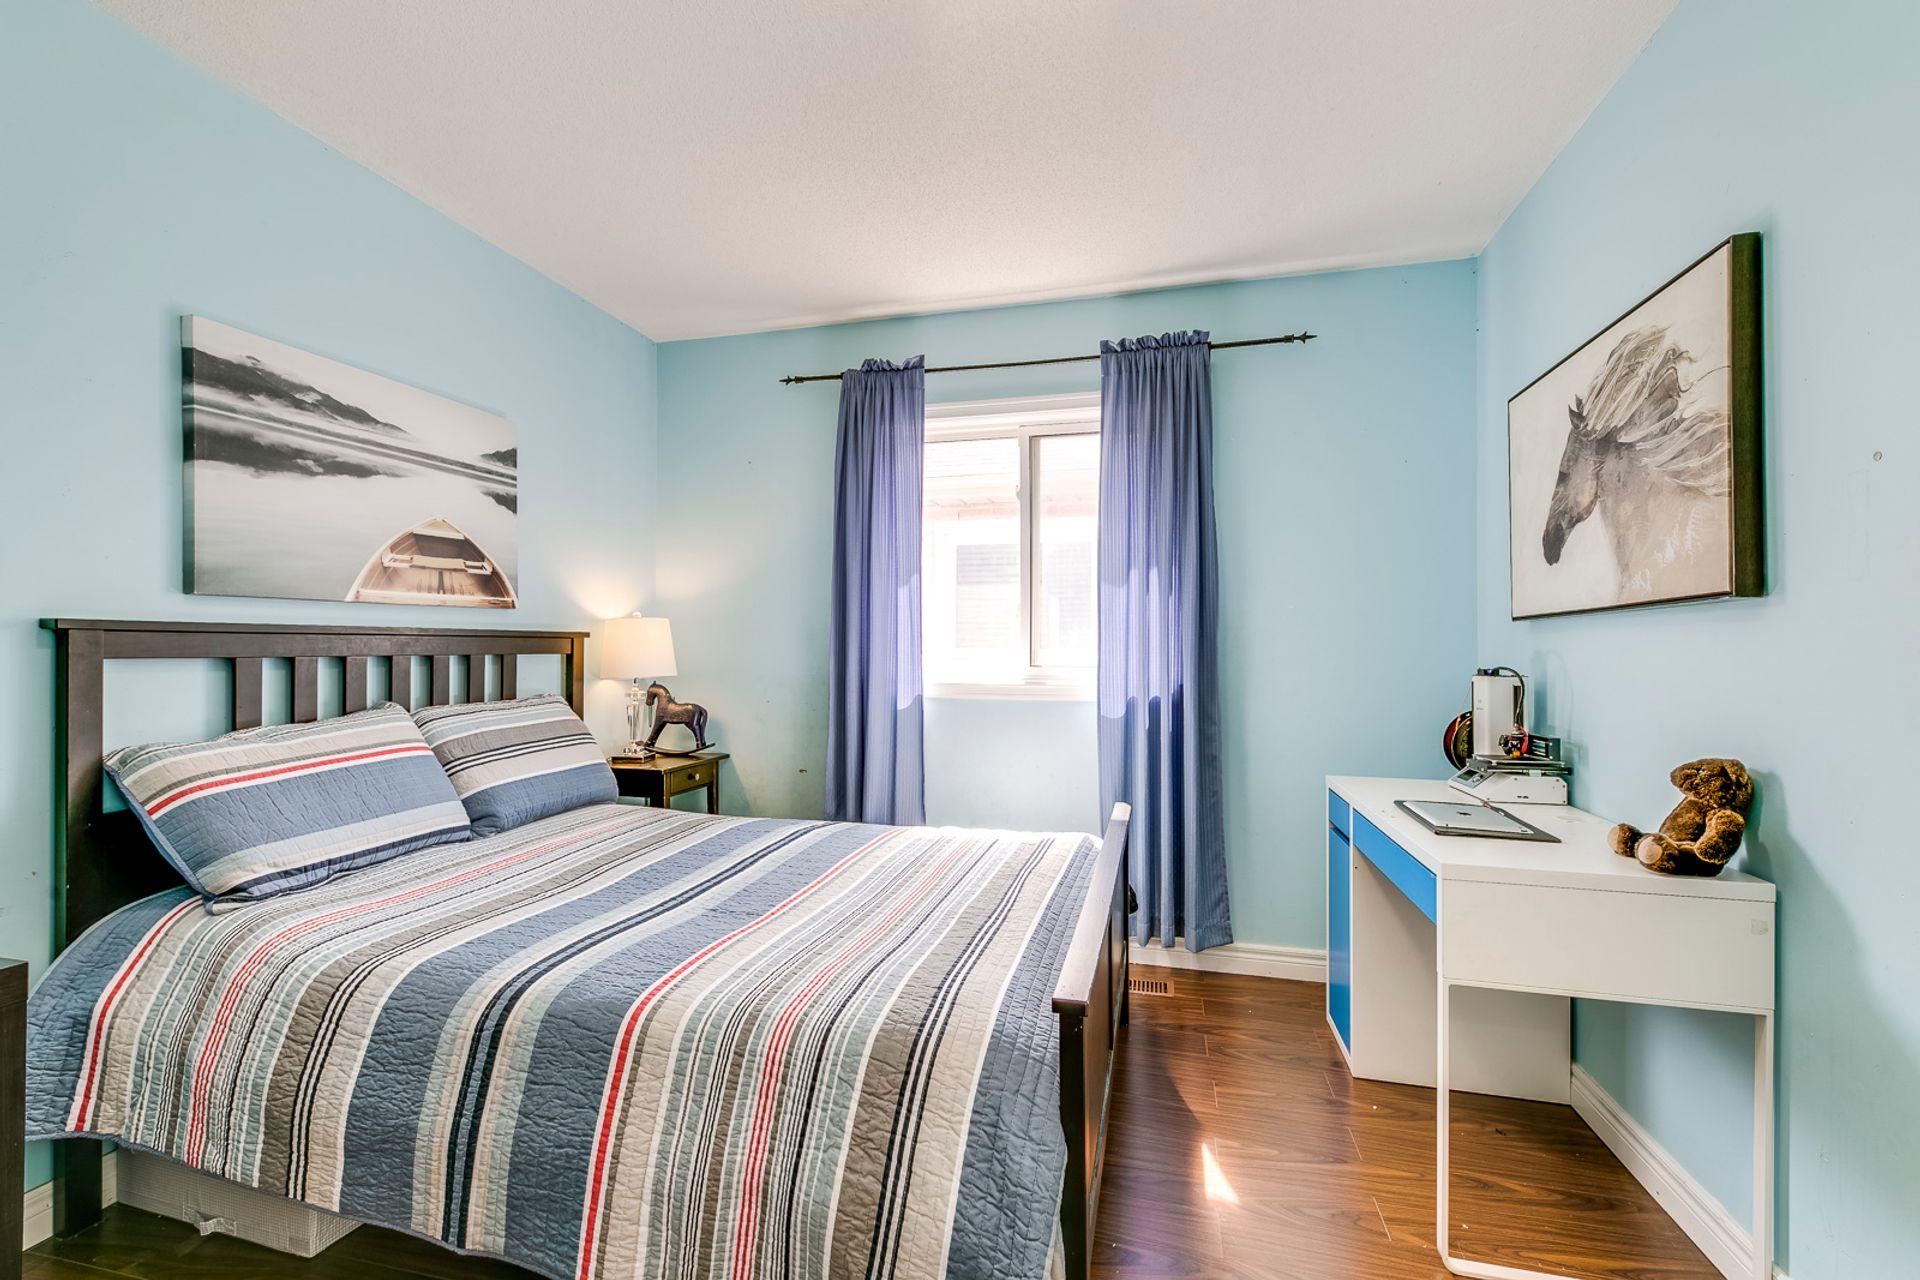 4th Bedroom - 972 Winterton Way, Mississauga - Elite3 & Team at 972 Winterton Way, East Credit, Mississauga